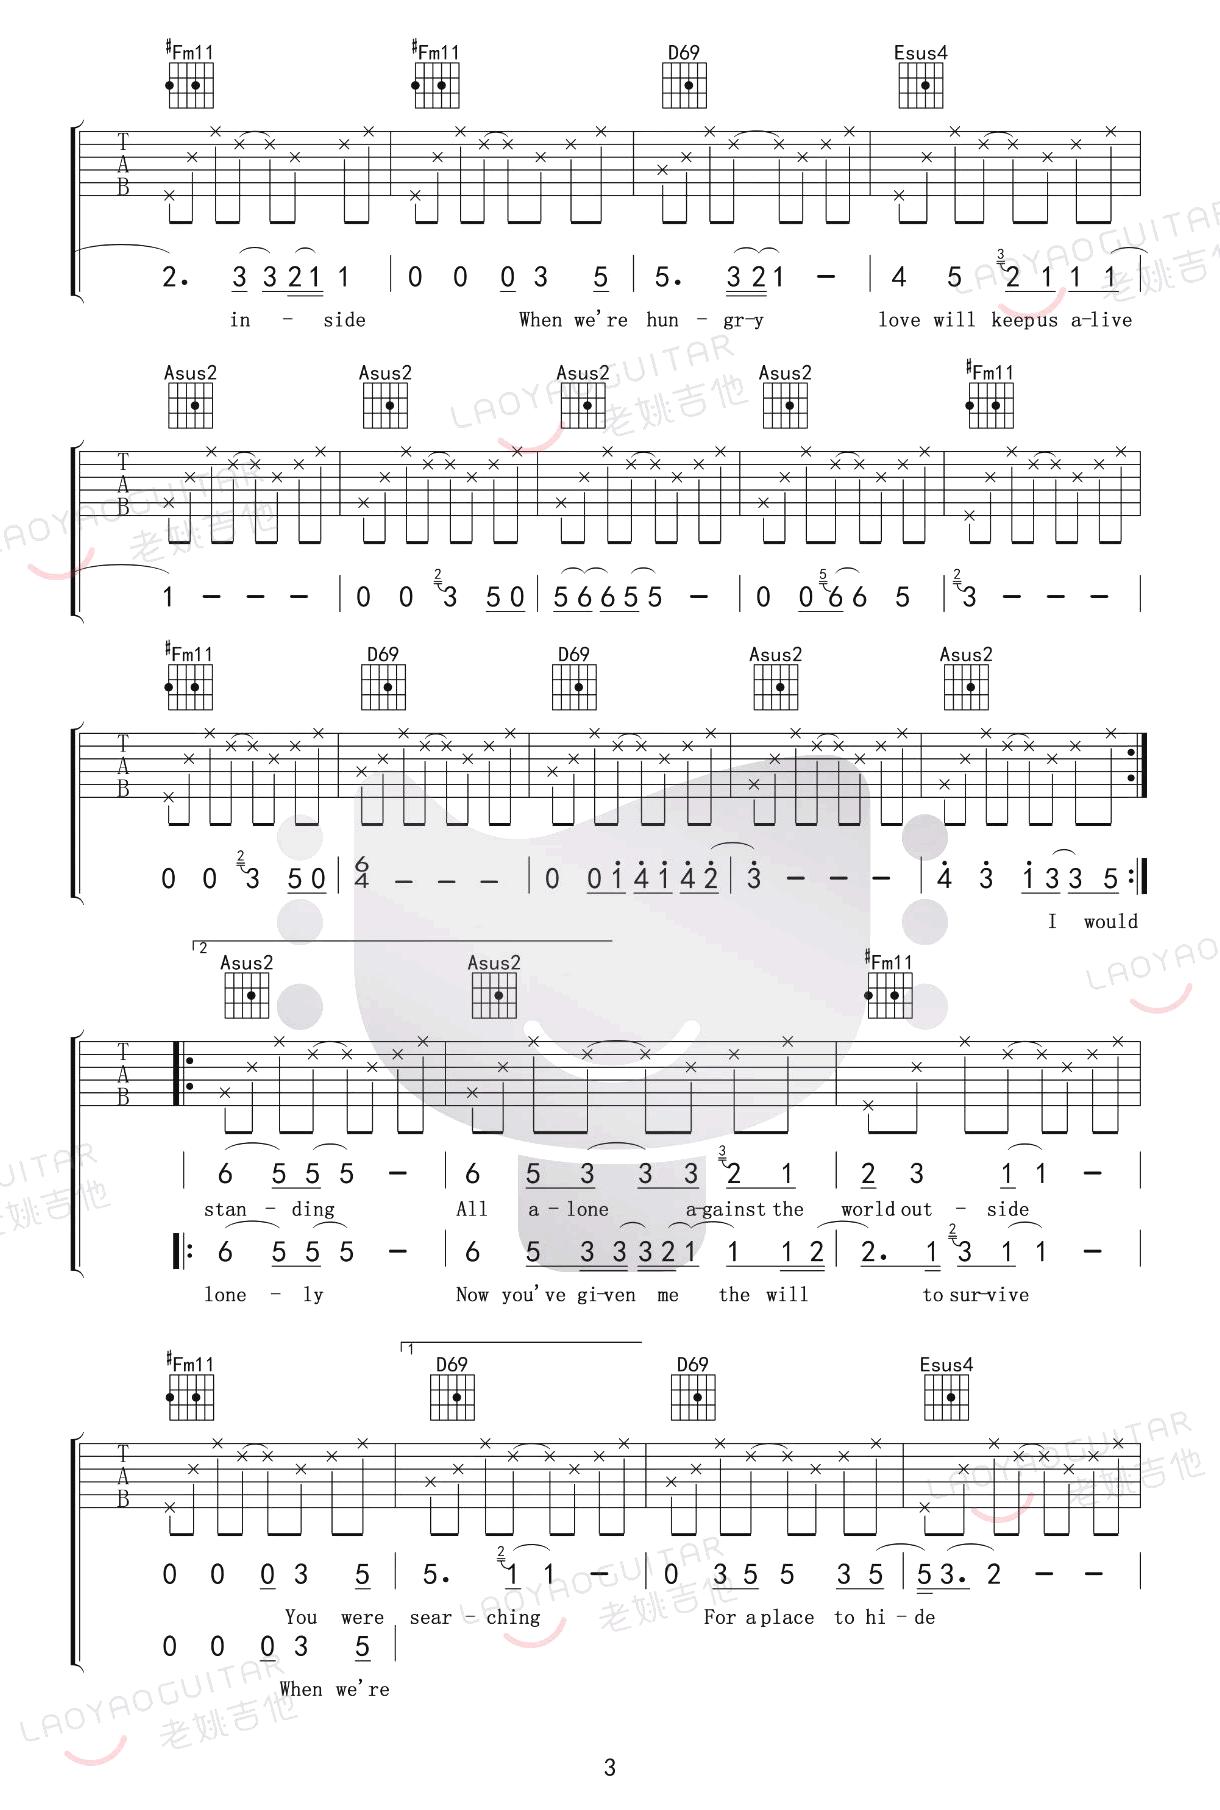 love will keep us alive吉他谱-老鹰乐队-3